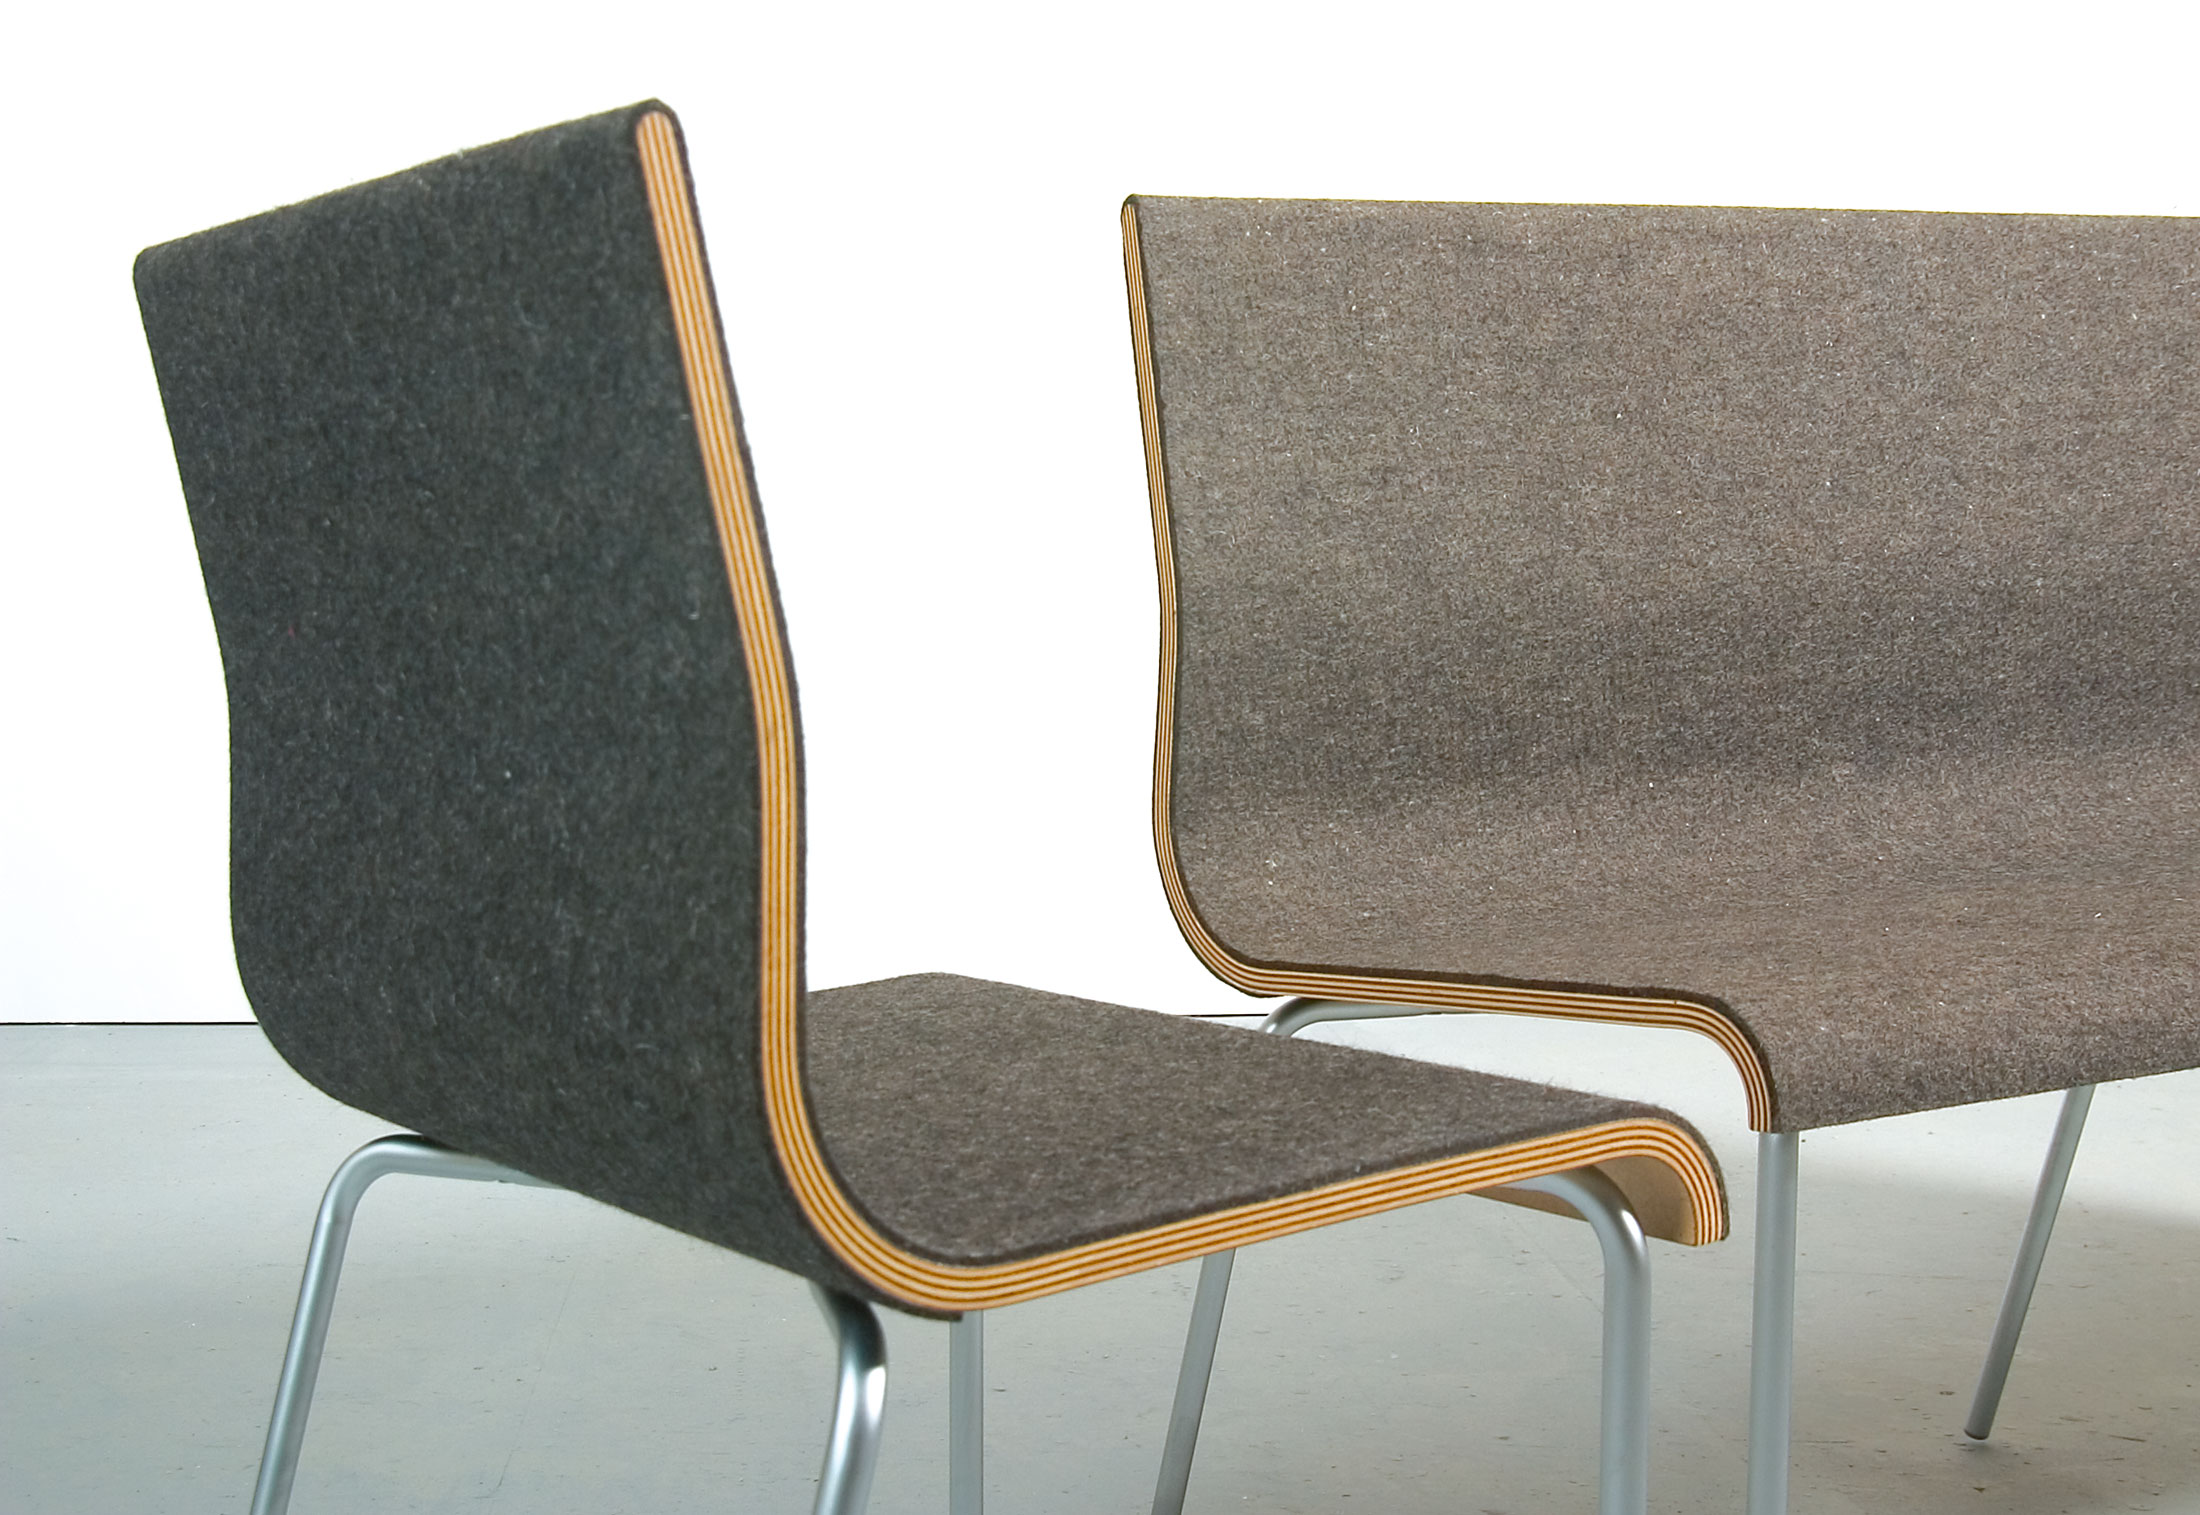 slow von sanktjohanser stylepark. Black Bedroom Furniture Sets. Home Design Ideas